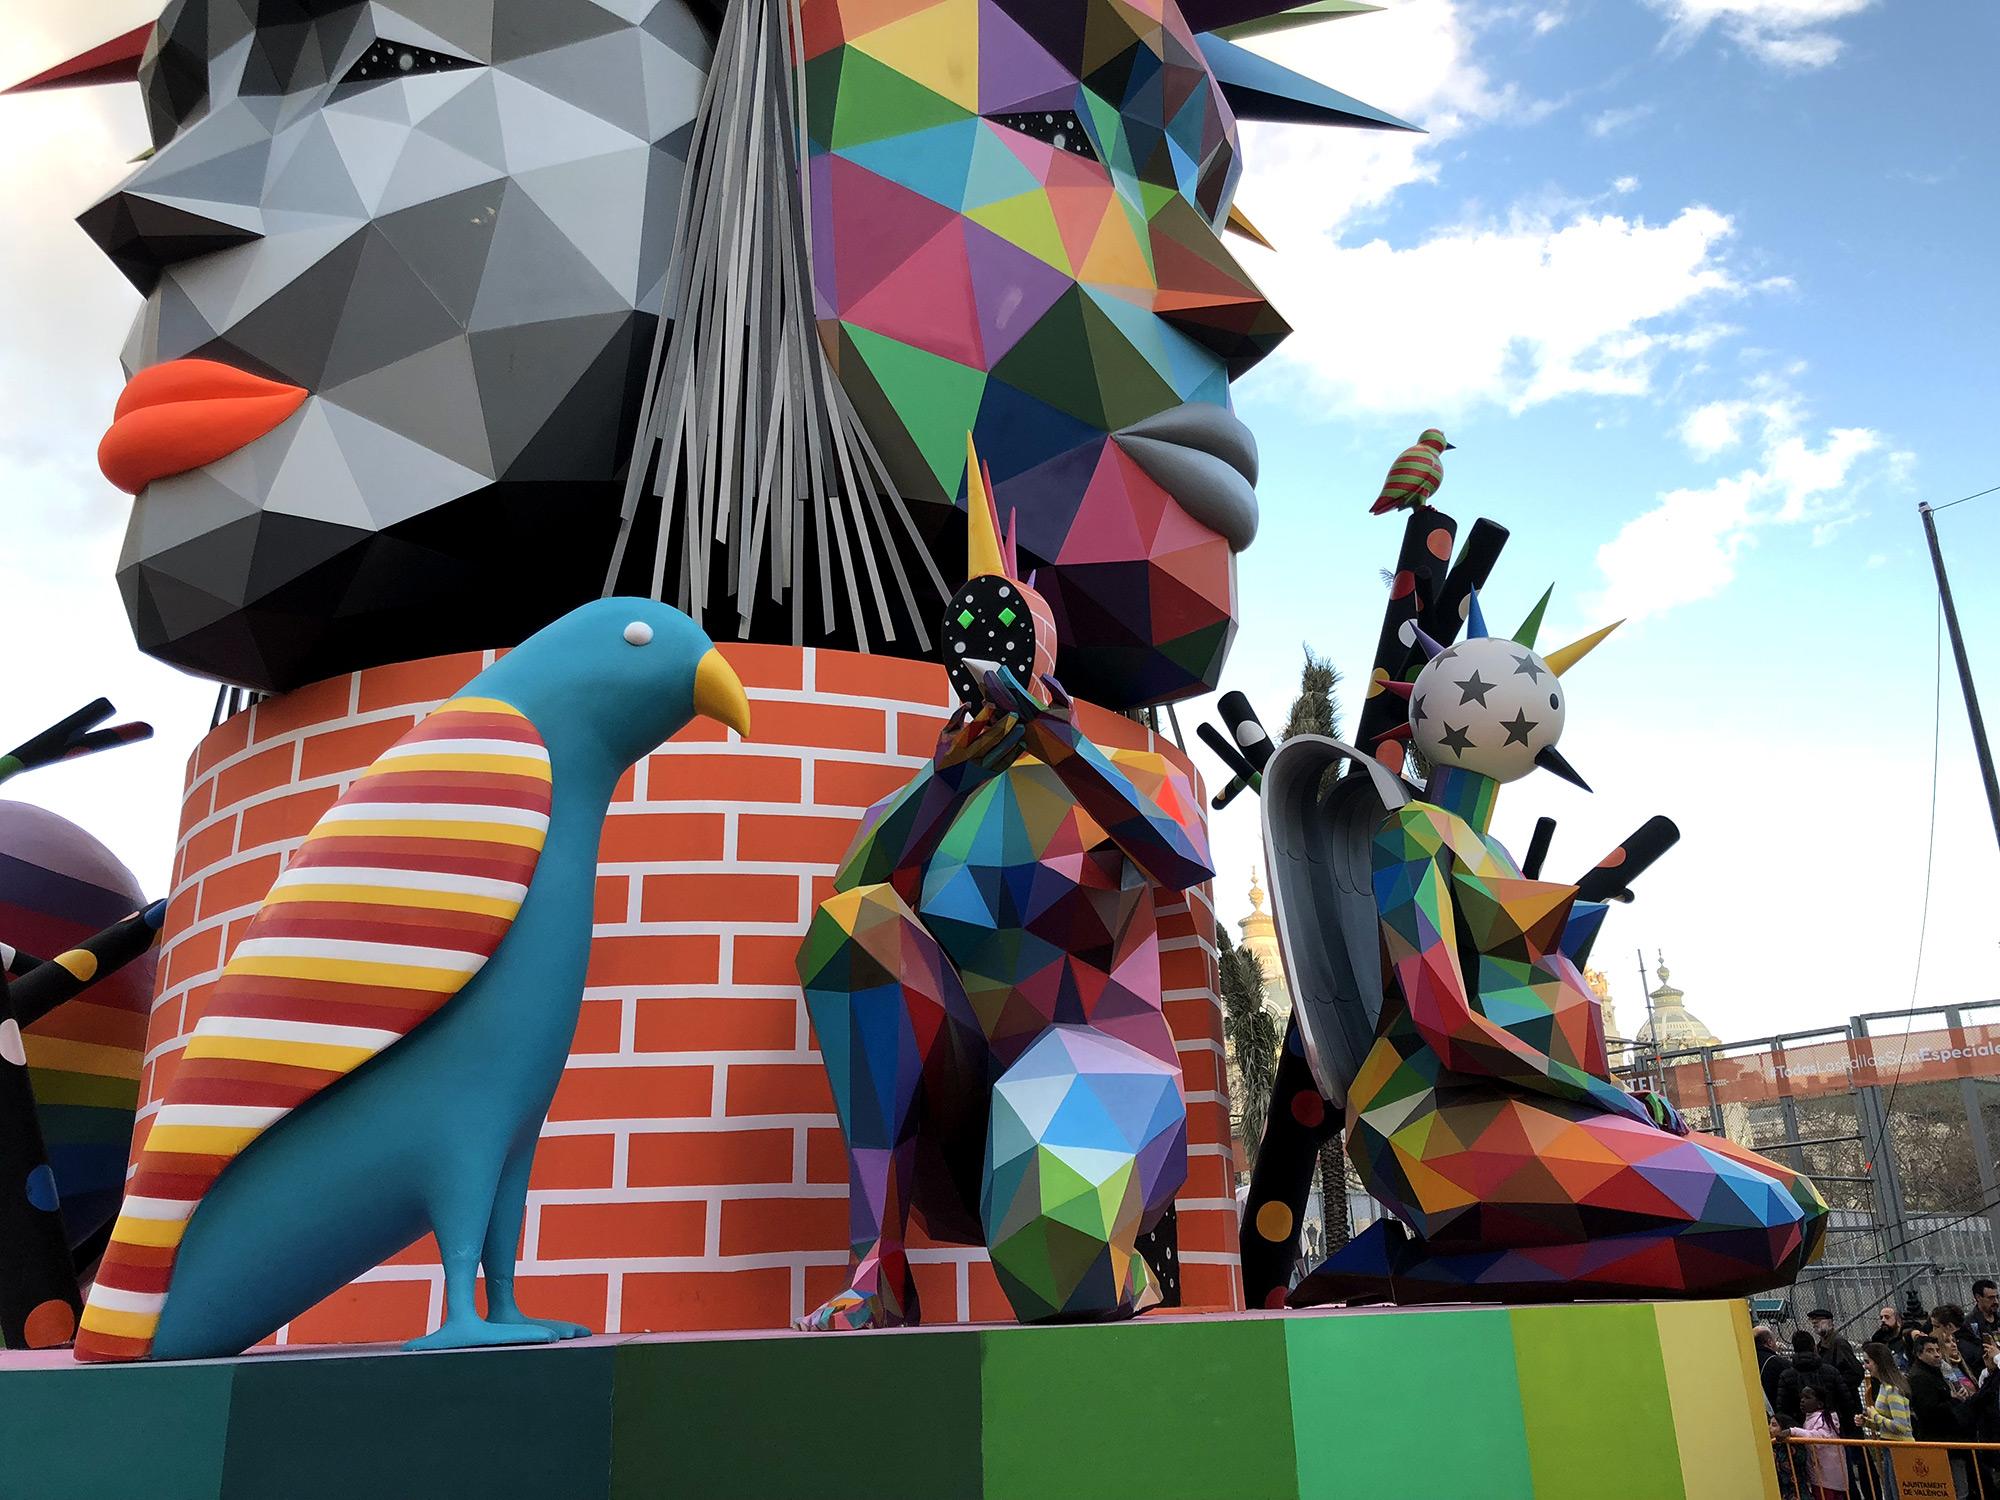 sculpture festivals festival artist okuda